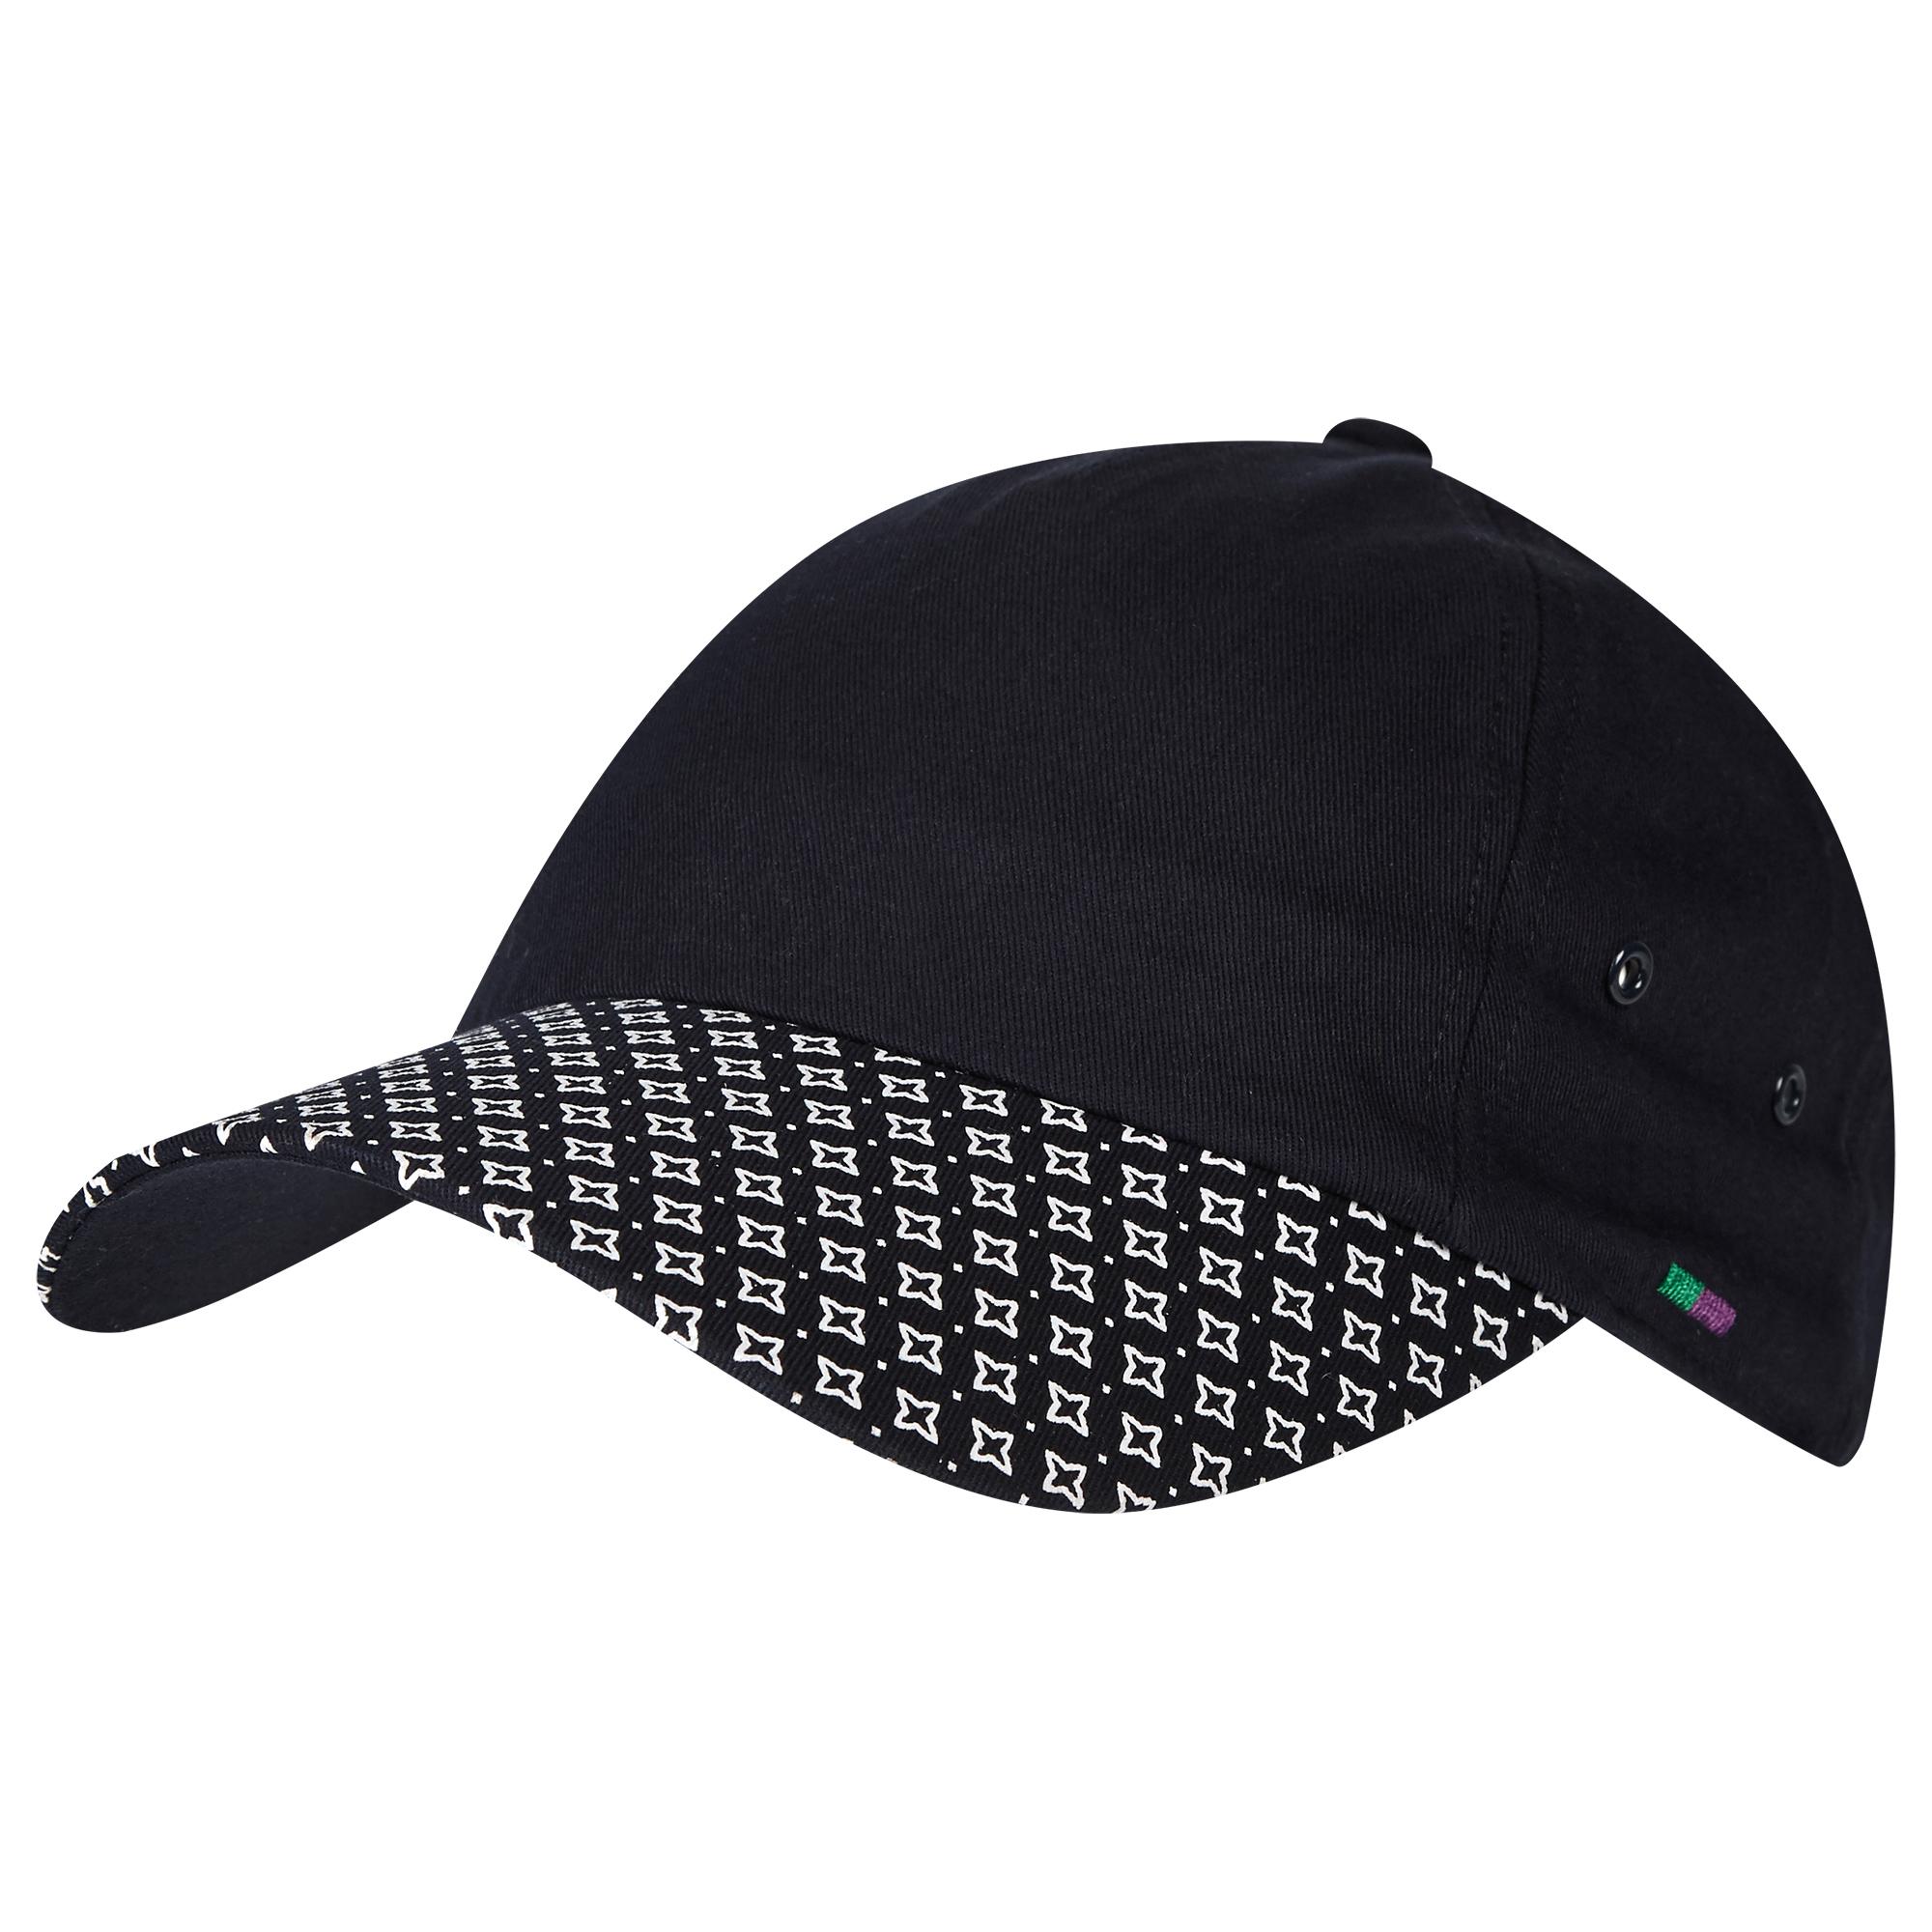 Wimbledon Printed Brim Cap - Midnight